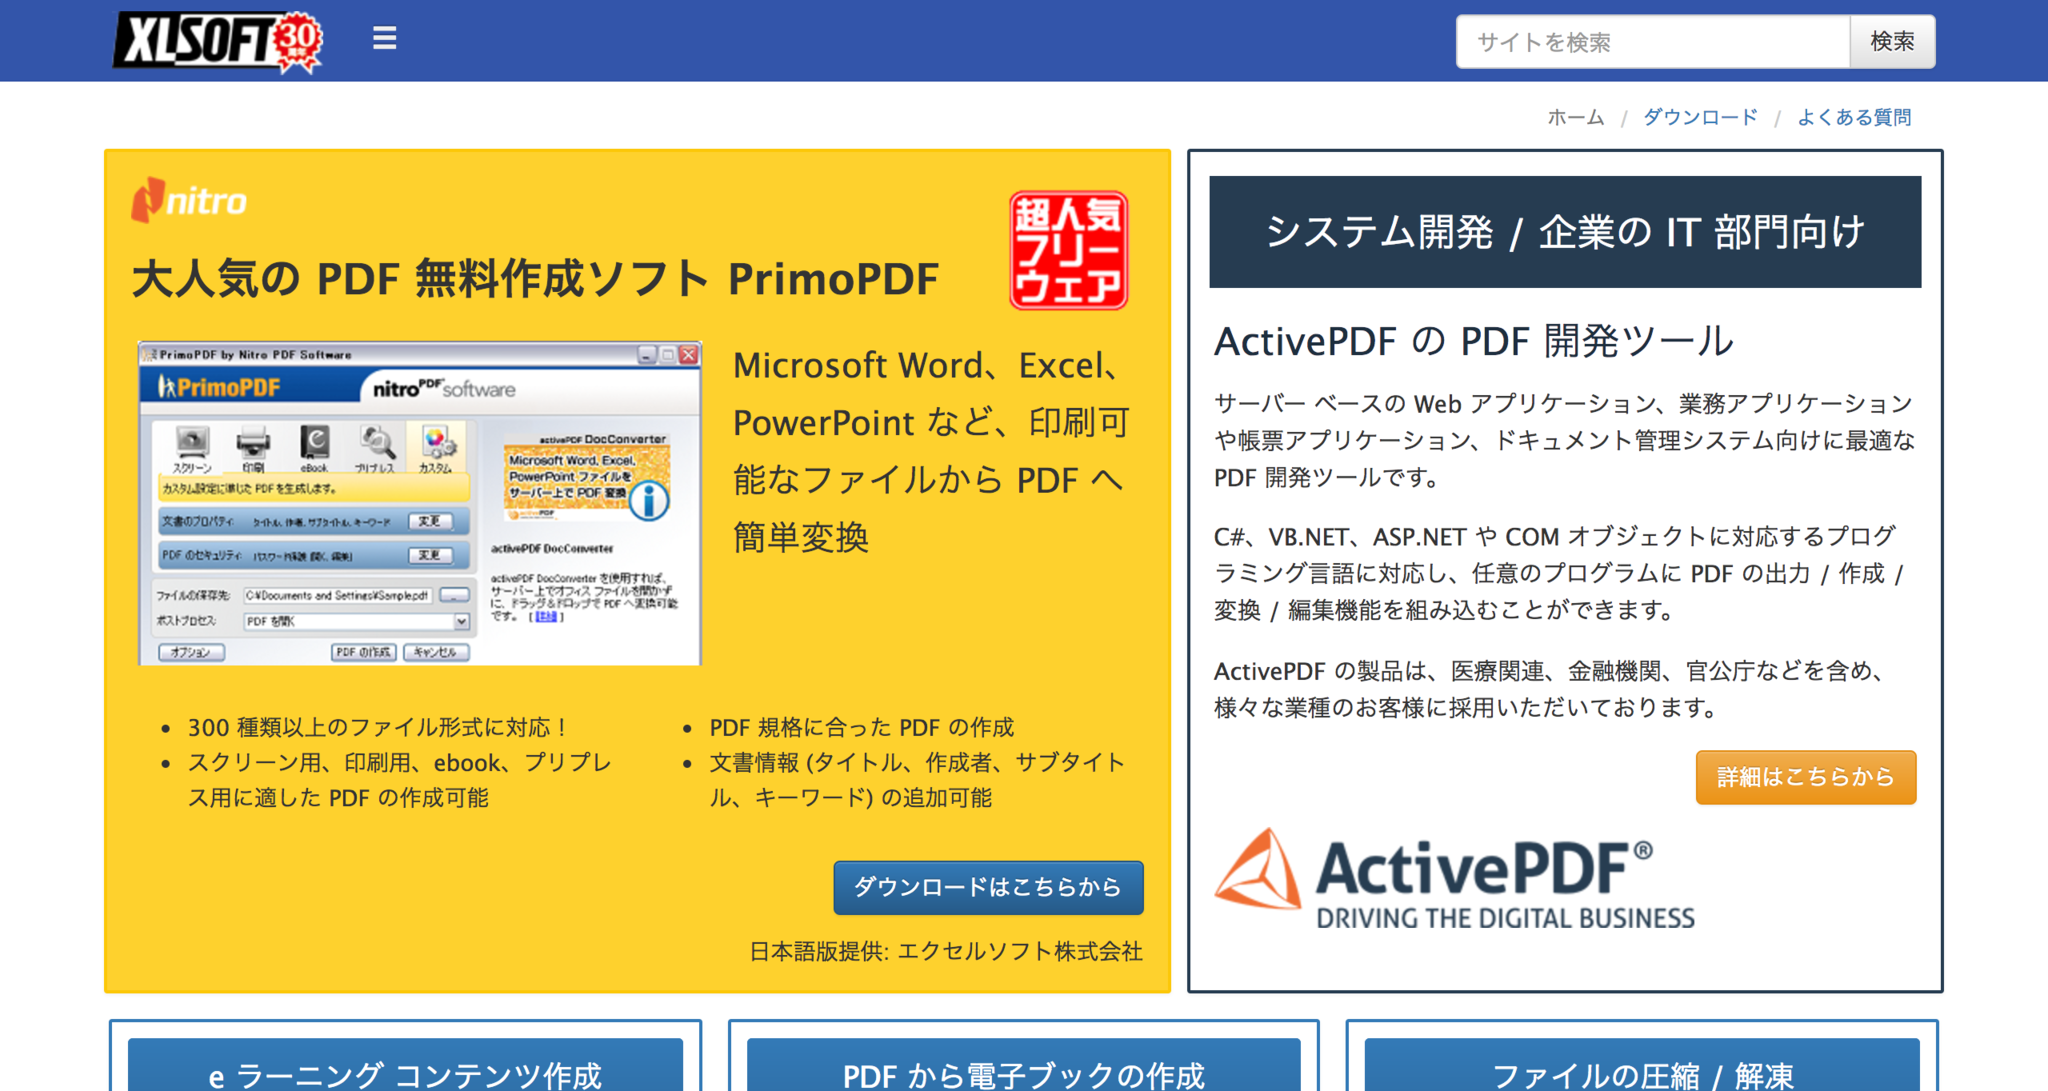 XLsoft_エクセルソフト___ActivePDF___Nitro_Software_無料_PDF_作成_変換ソフトウェア_PrimoPDF_4.1_日本語版___ホーム.png